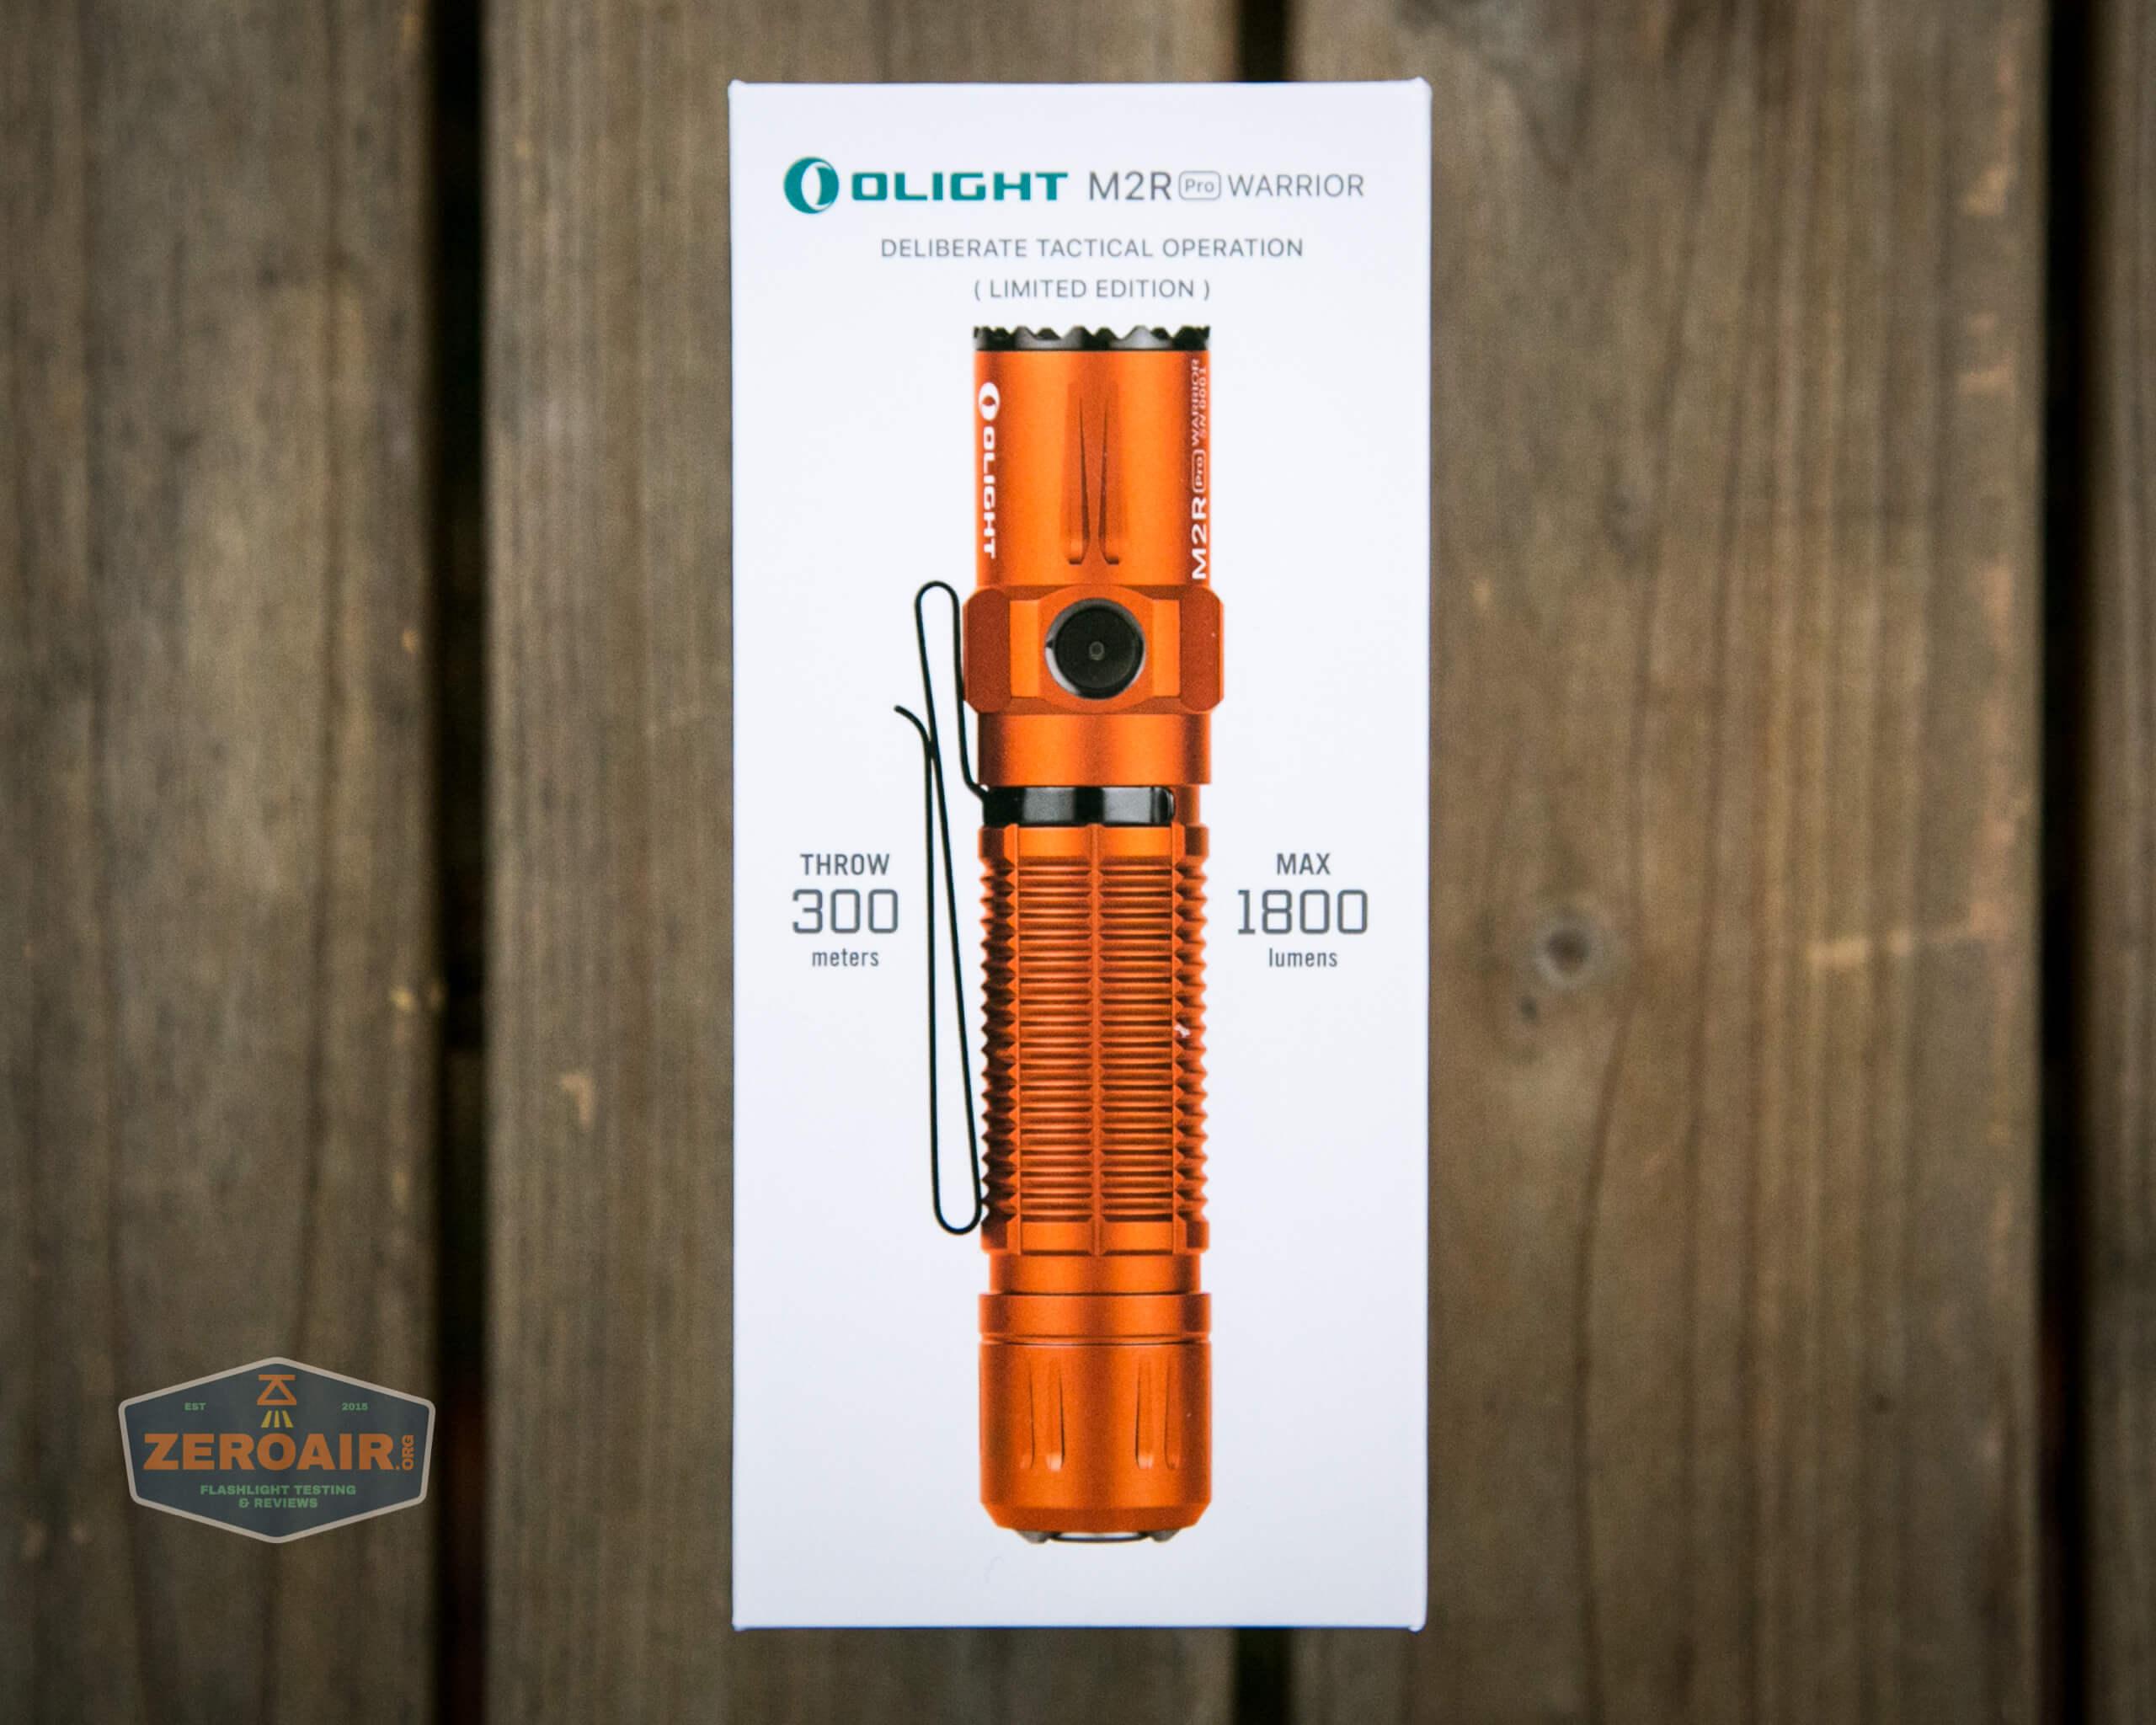 Olight M2R Pro Warrior Orange box